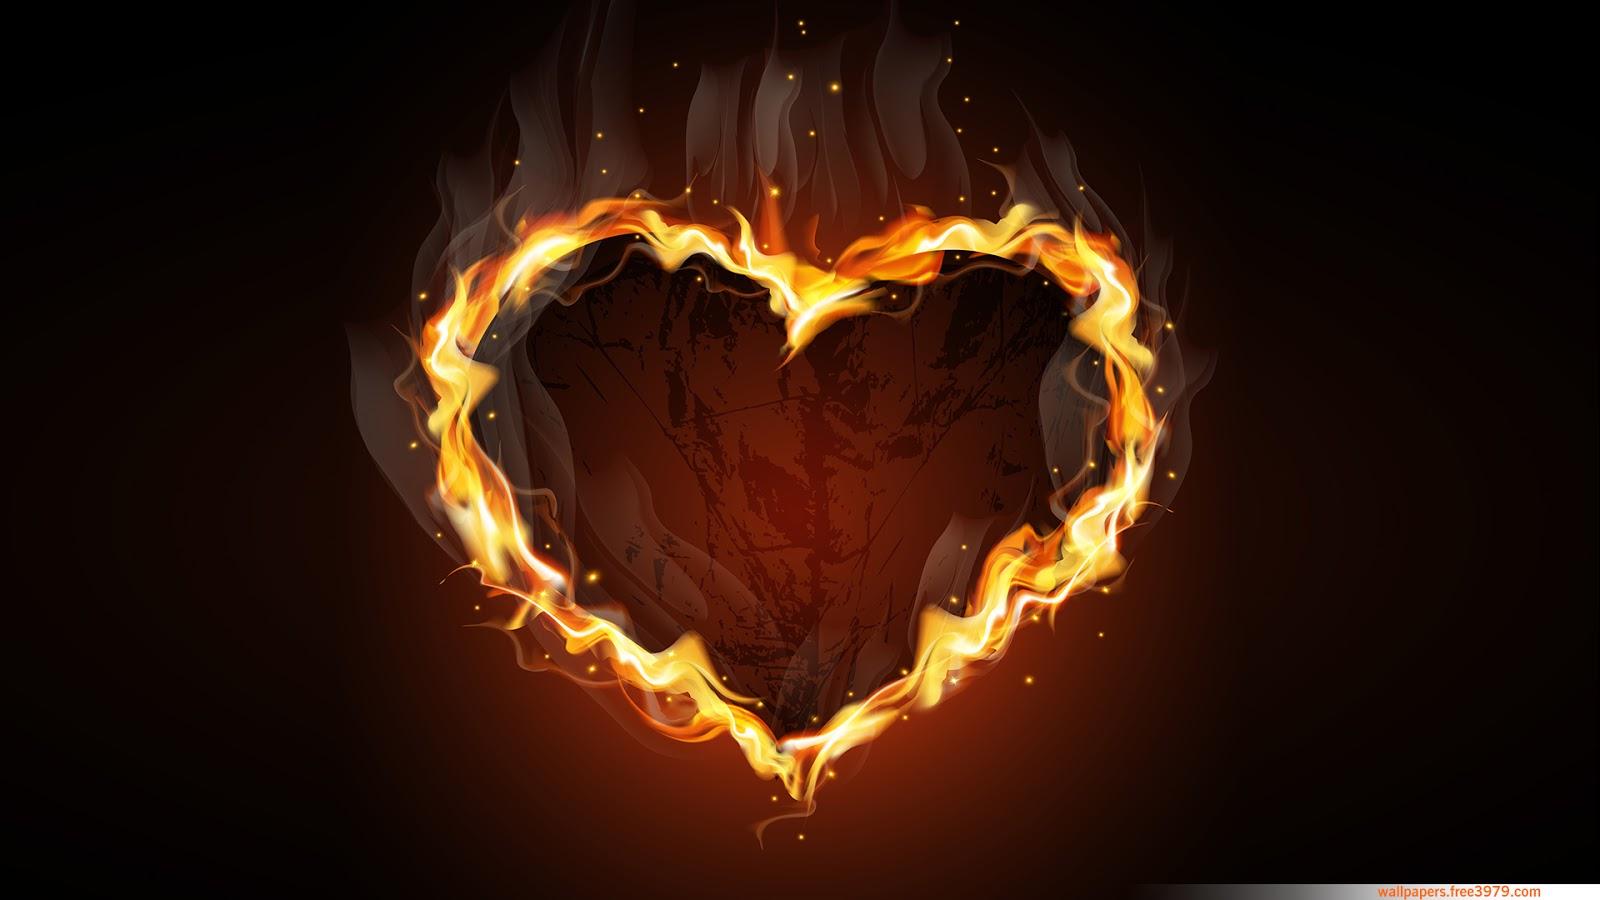 Heart Fire HD Wallpaper | Wallpapers-Wallpaper Free 3979